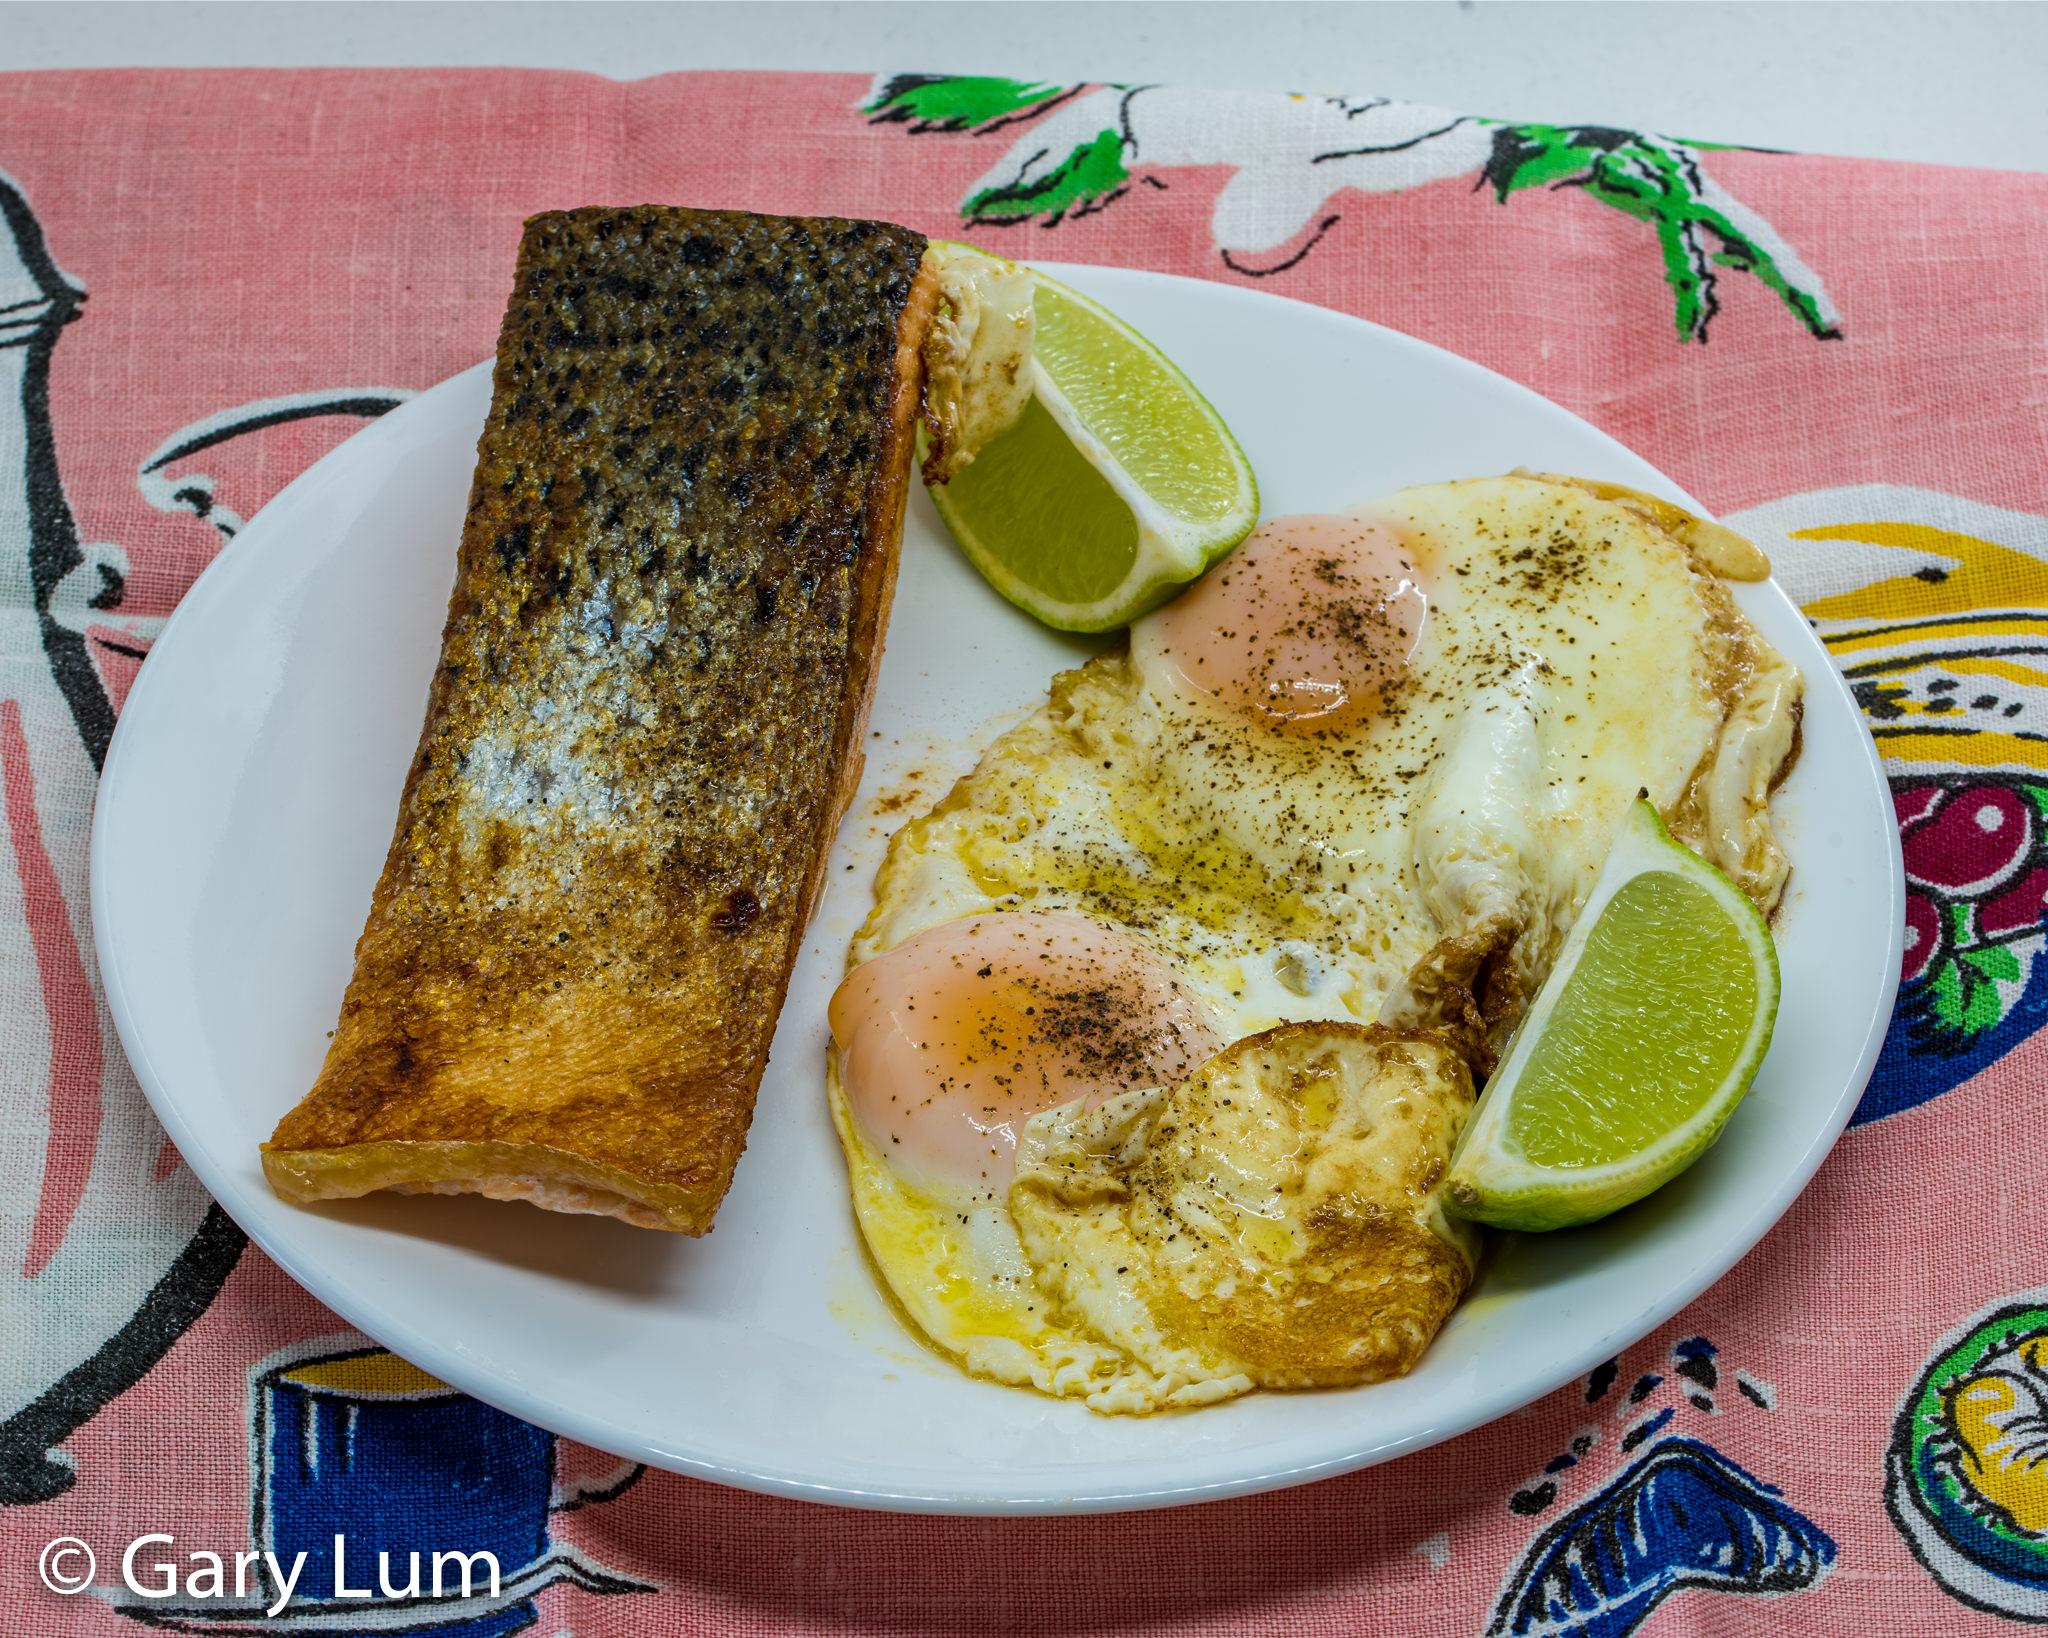 Pan-fried salmon with fried eggs. Gary Lum.